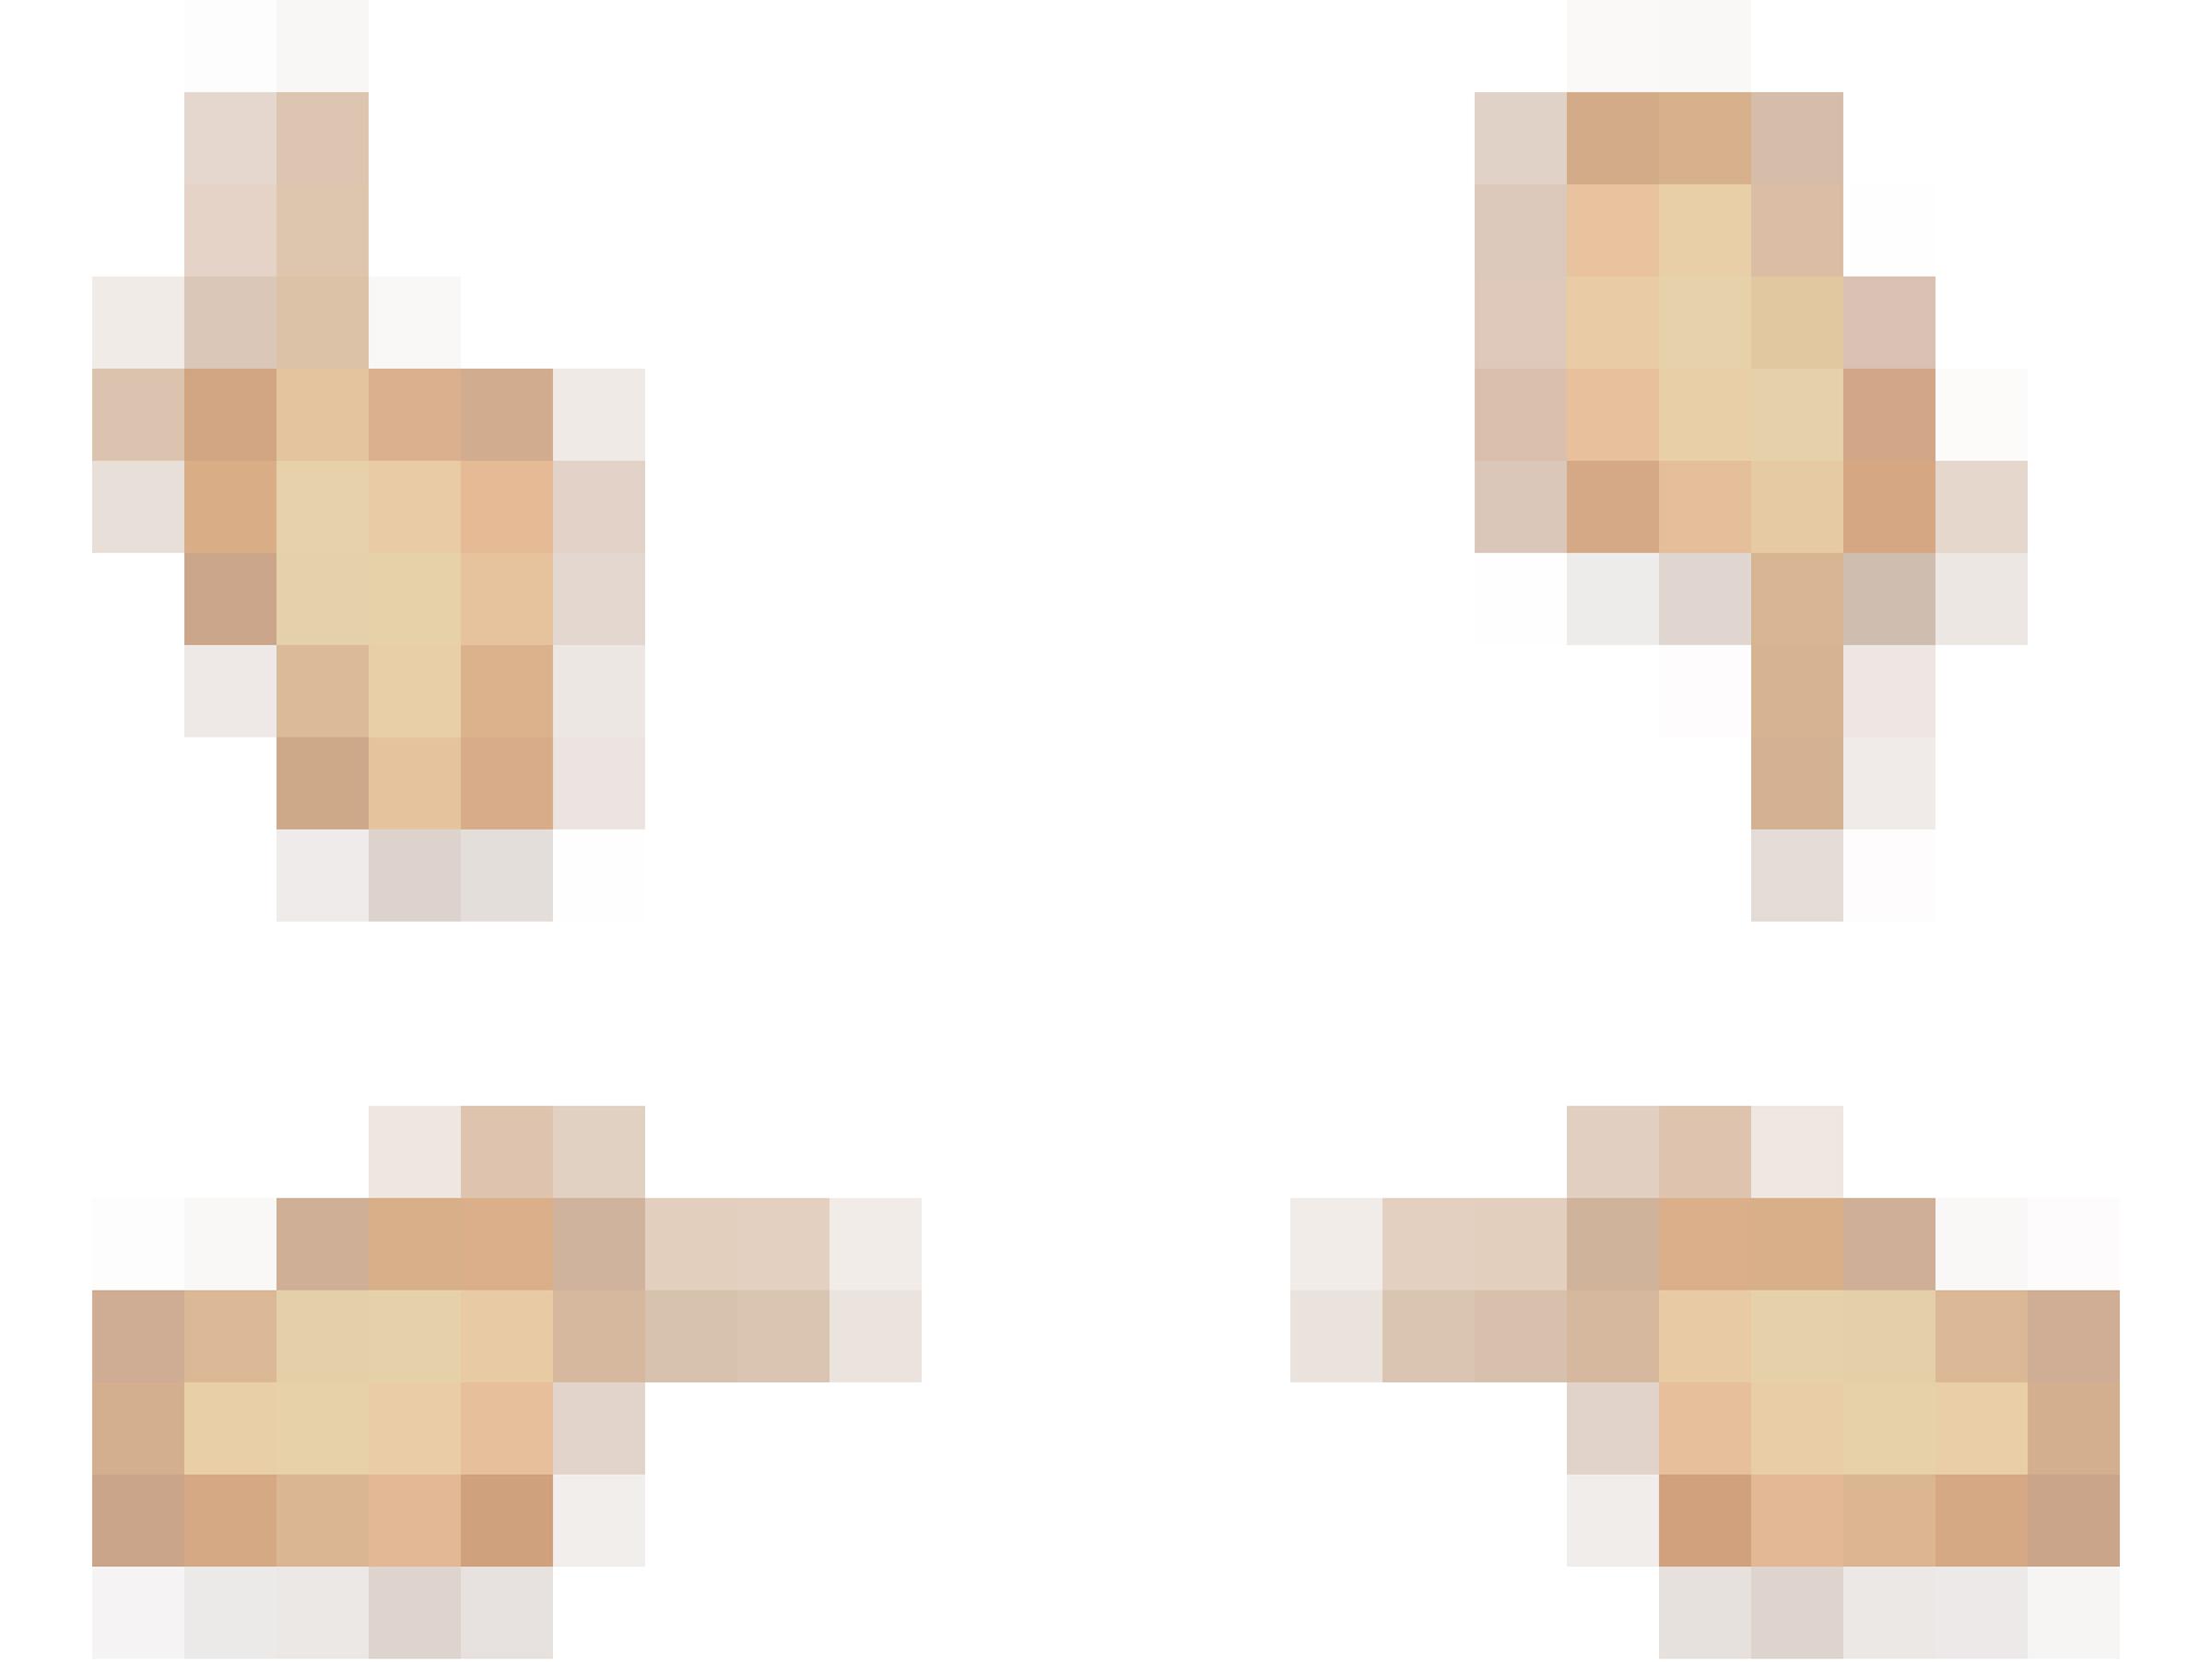 pointing-fingers-emoji